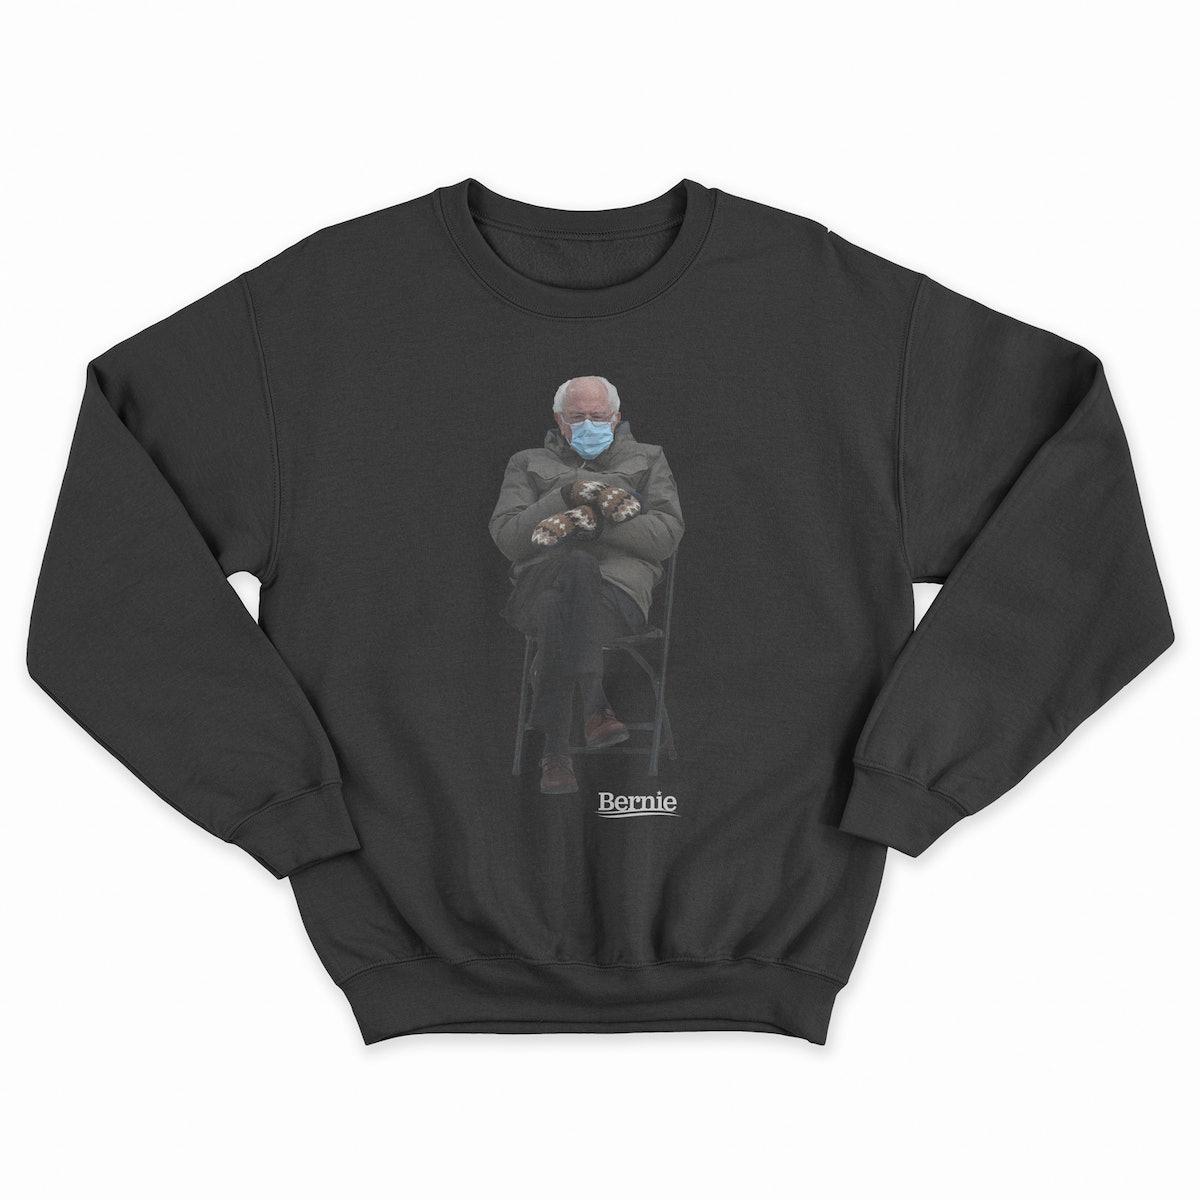 The Bernie Sanders' inauguration meme sweatshirt proceeds went to charity.